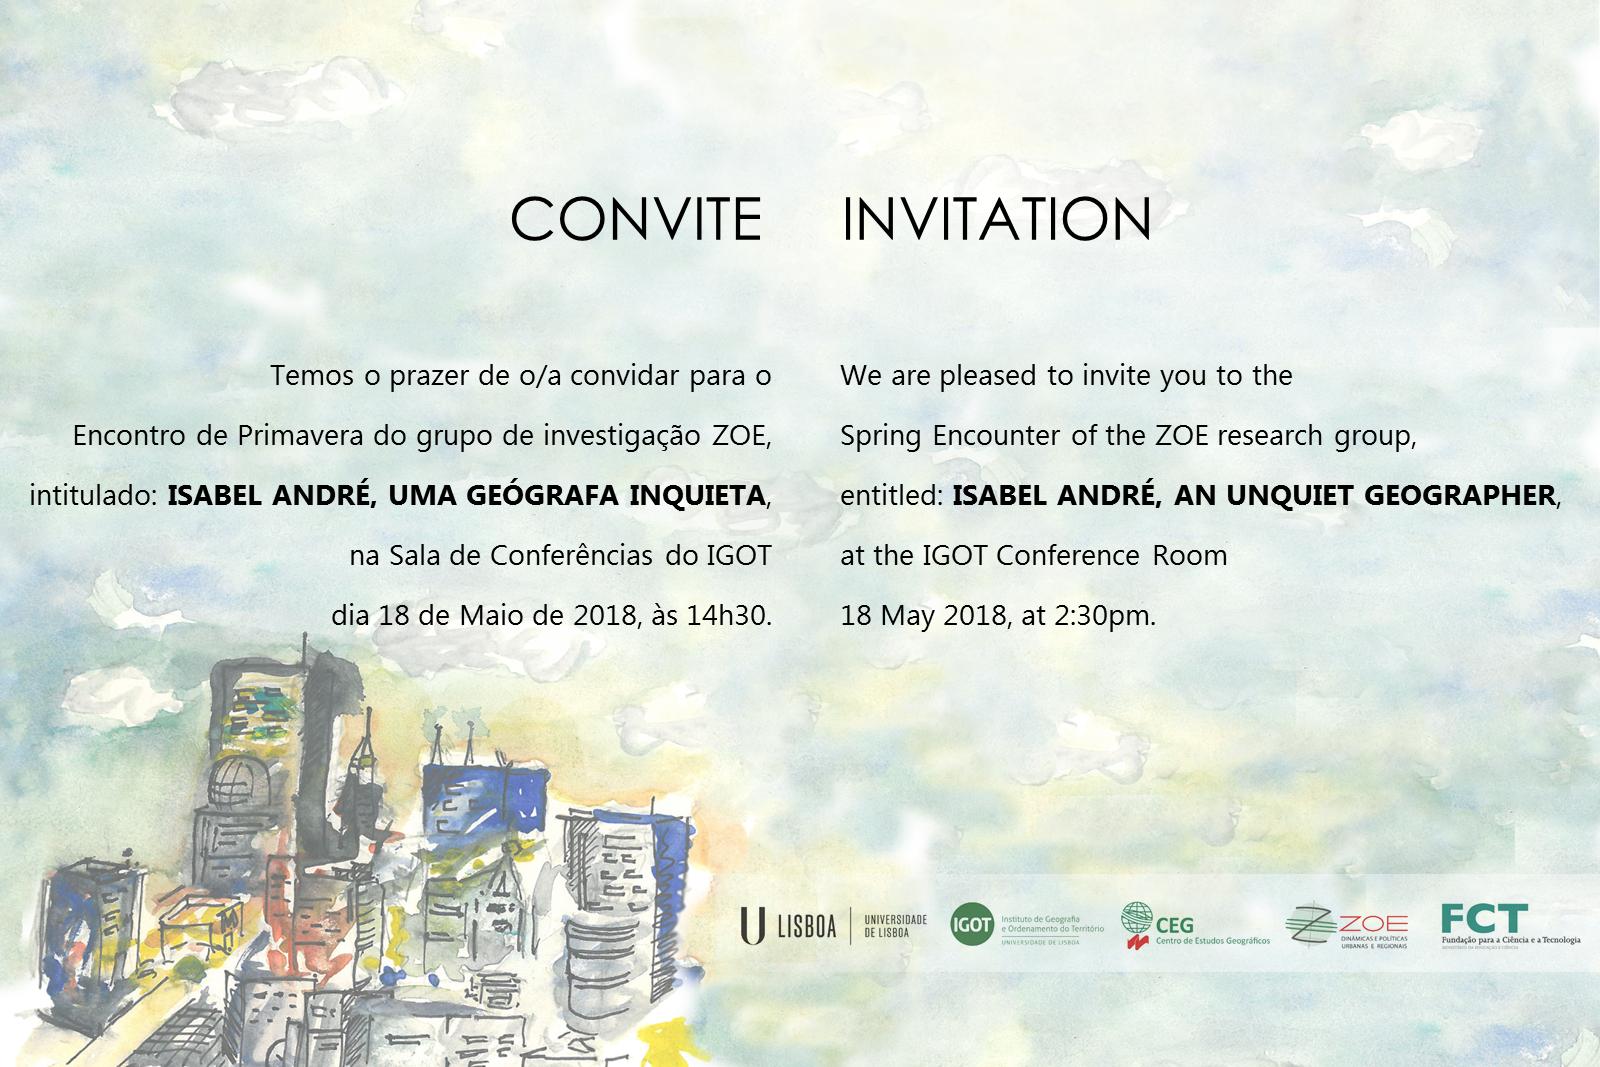 convite_18maio18